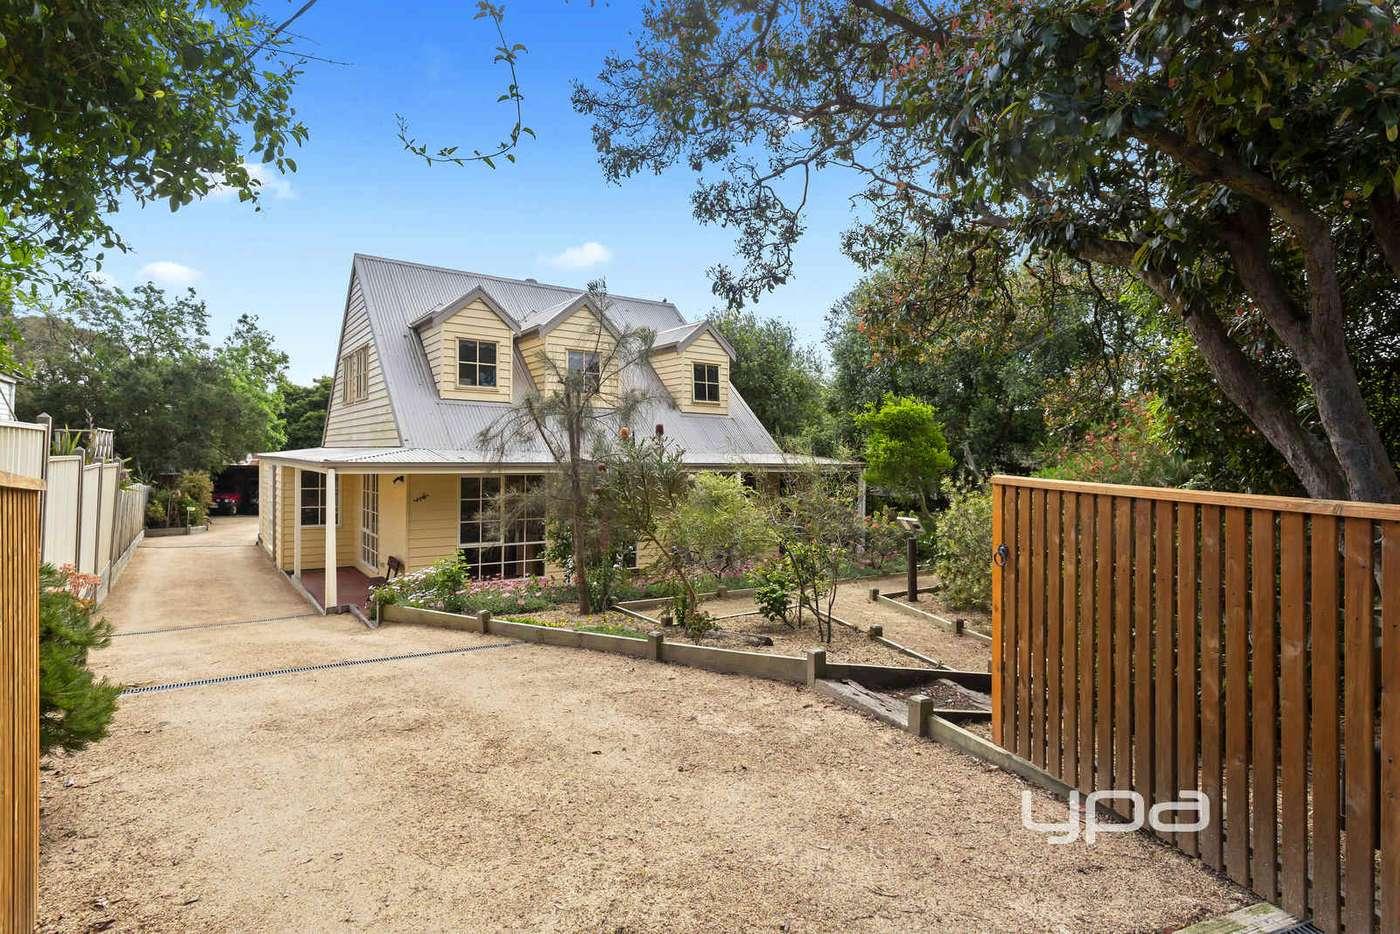 Main view of Homely house listing, 116 Flinders Street, Mccrae VIC 3938